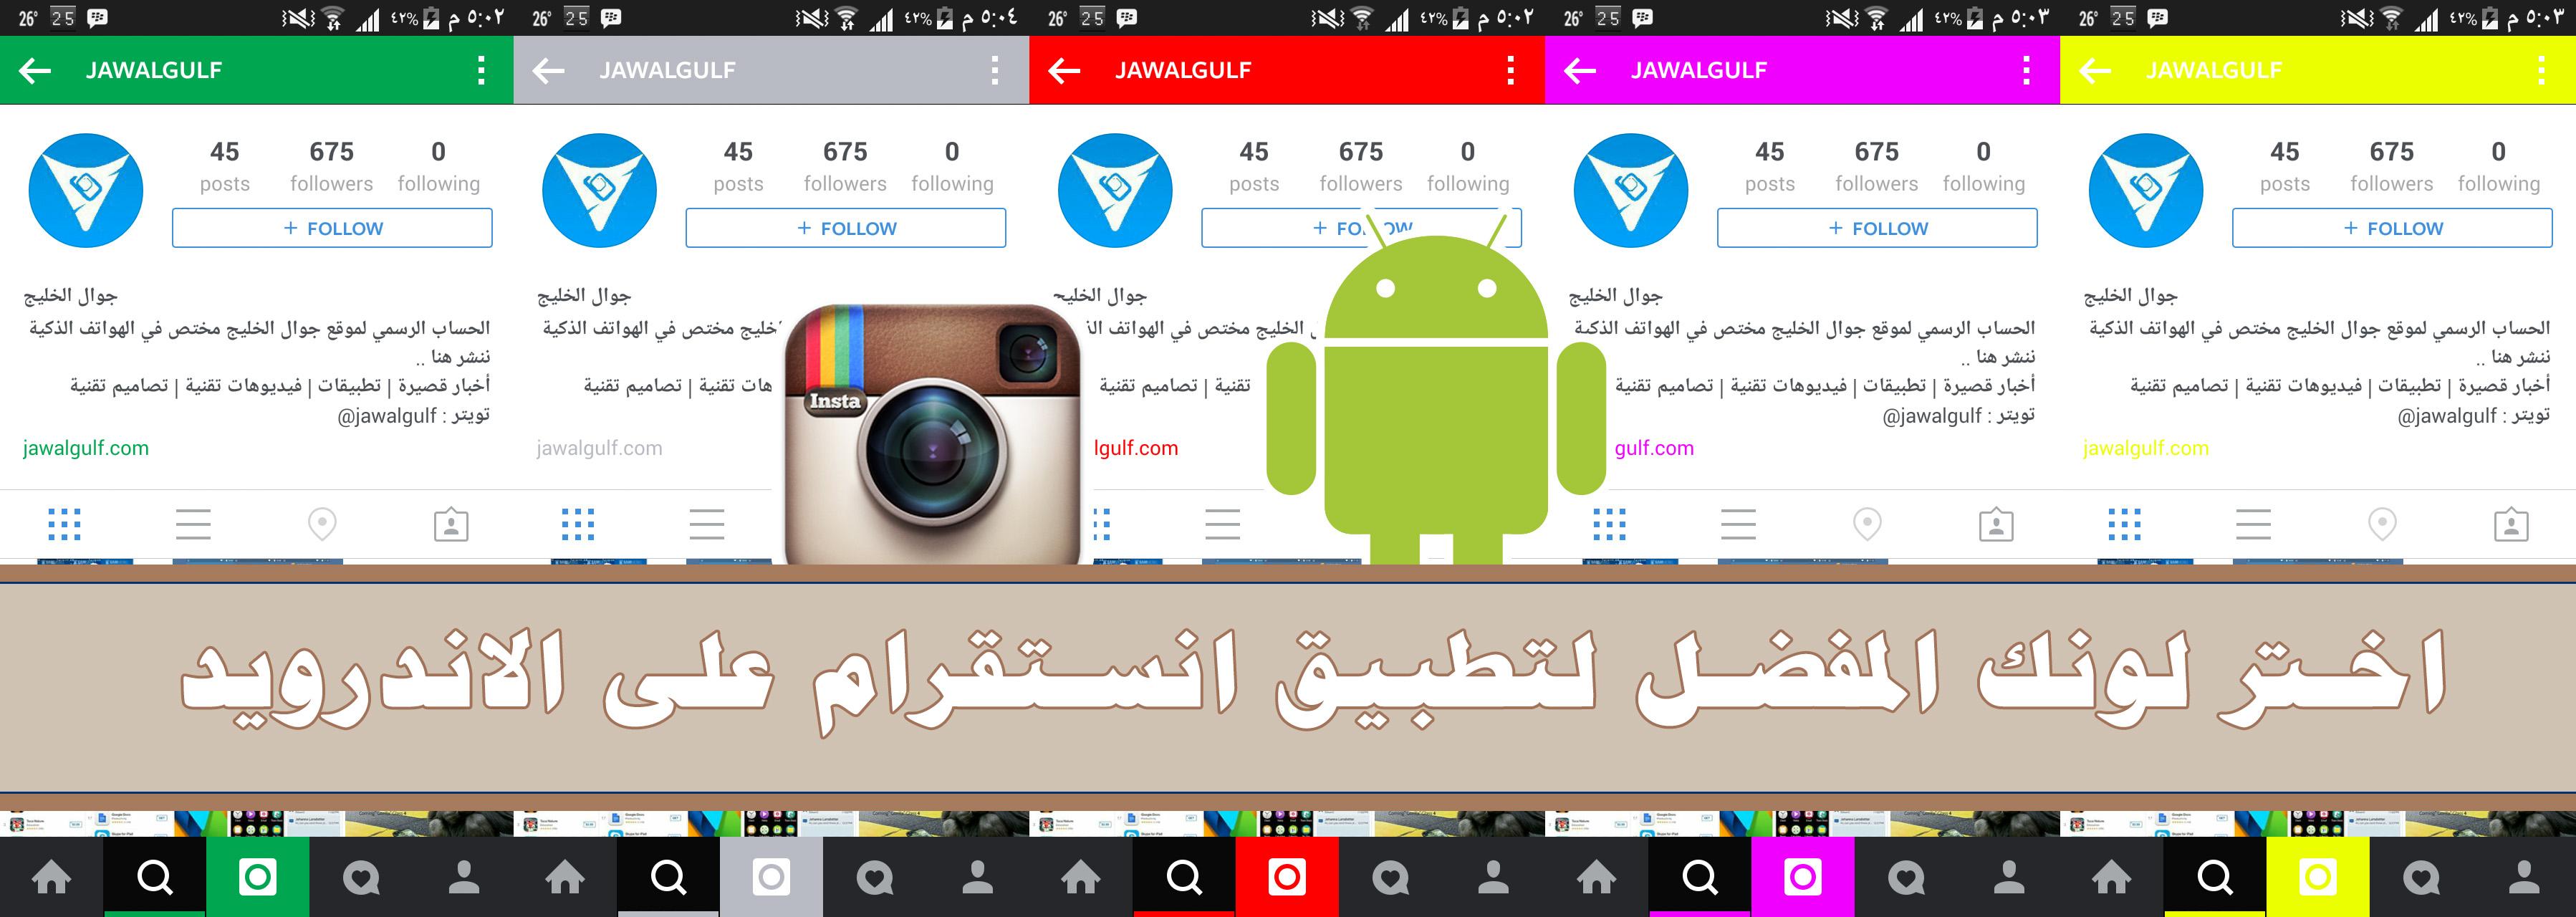 Screenshot_٢٠١٥-٠٢-٢٥-١٧-٠٢-٠٨